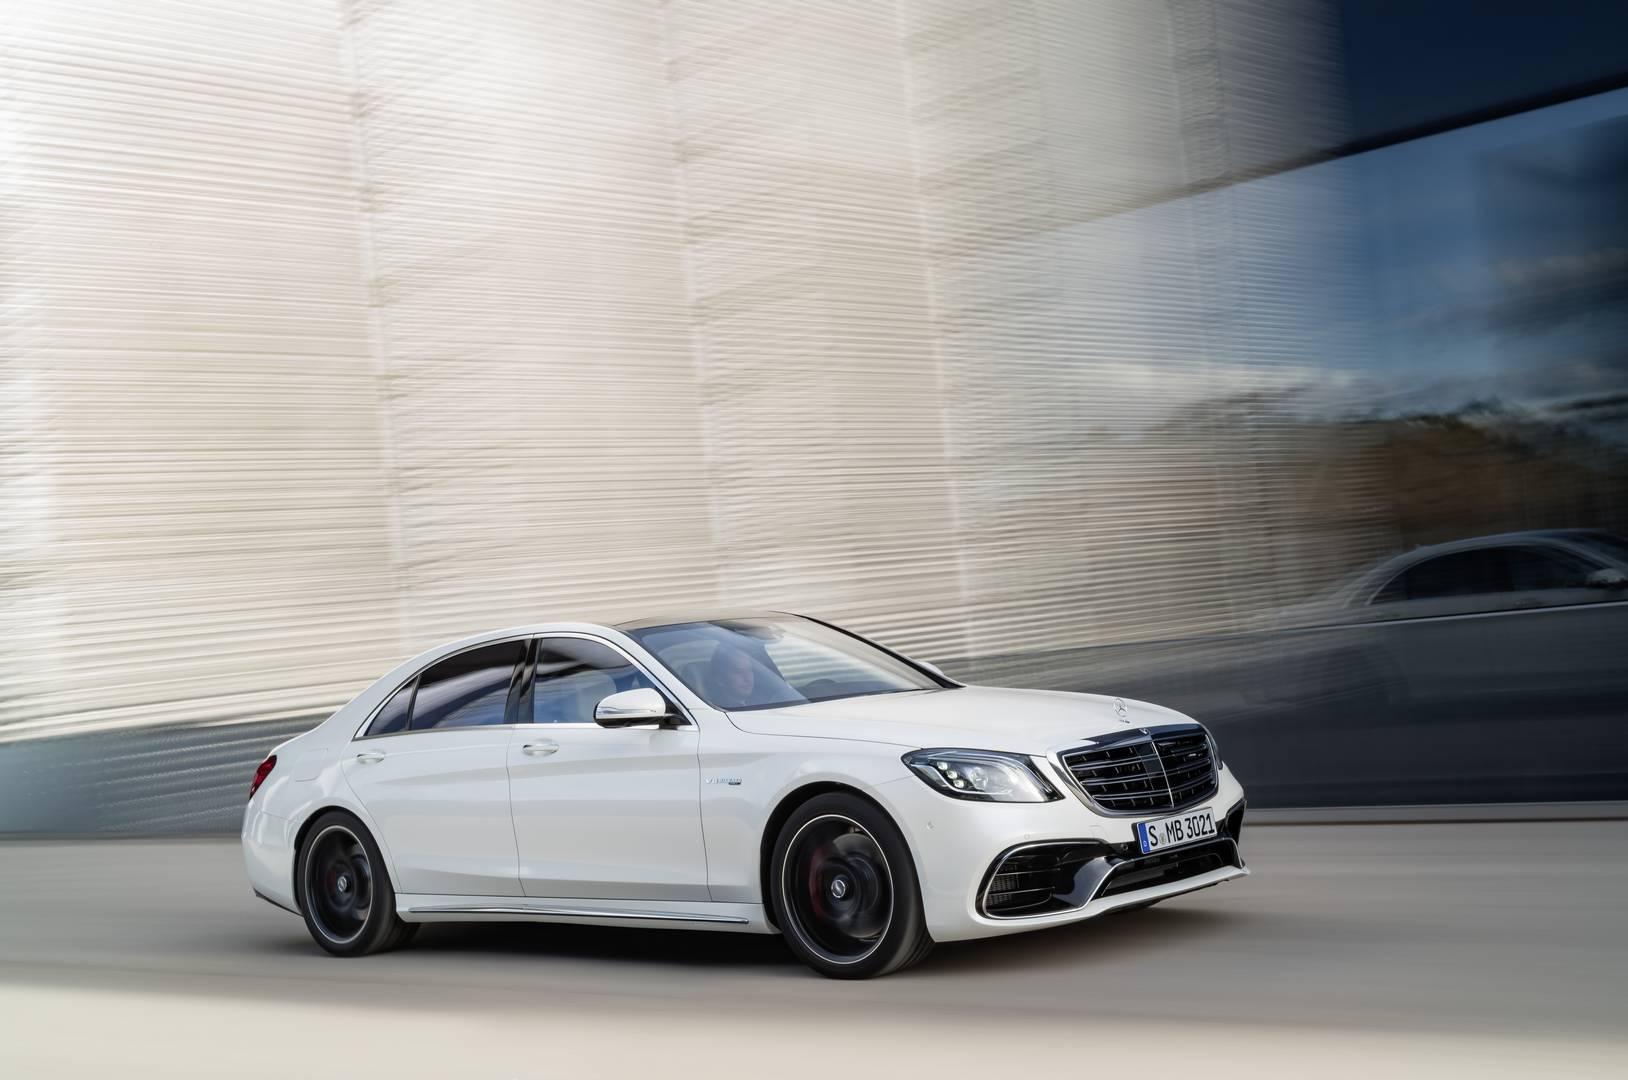 2017 Mercedes S63 Amg All Car Brands Specs